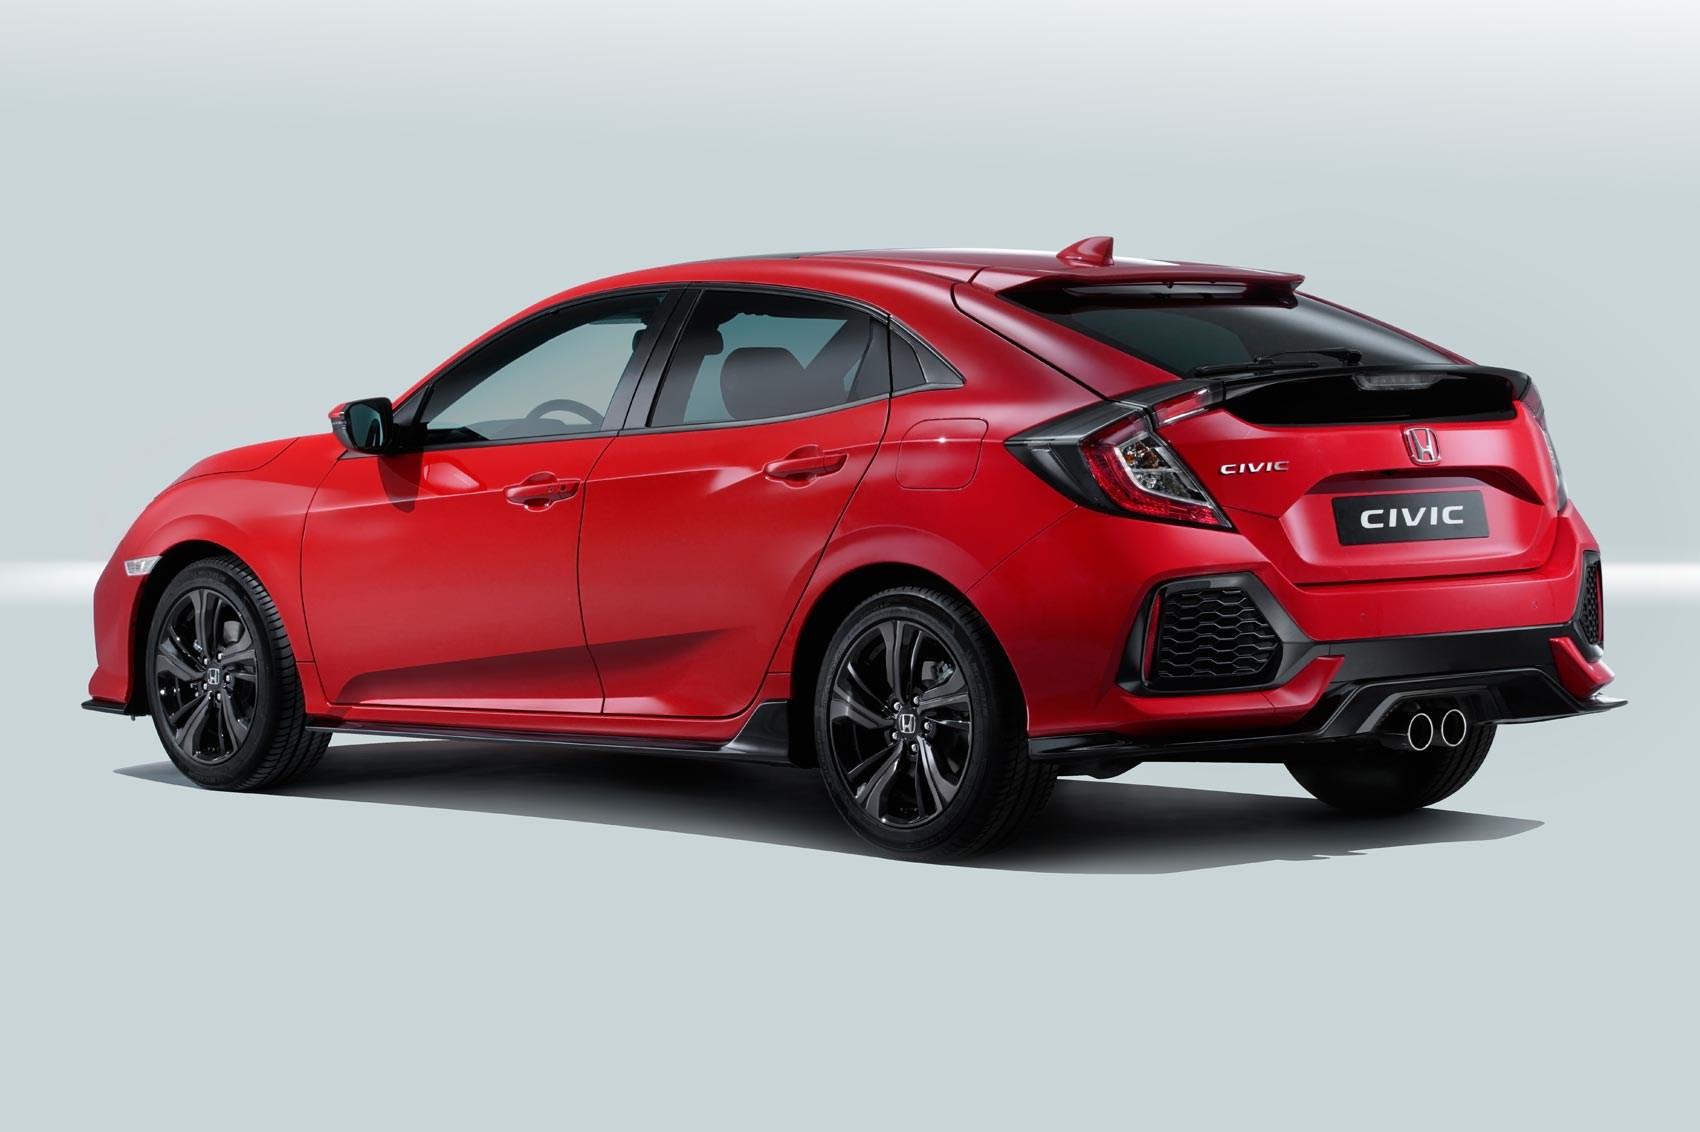 Honda-Civic-new-cars-under-20000